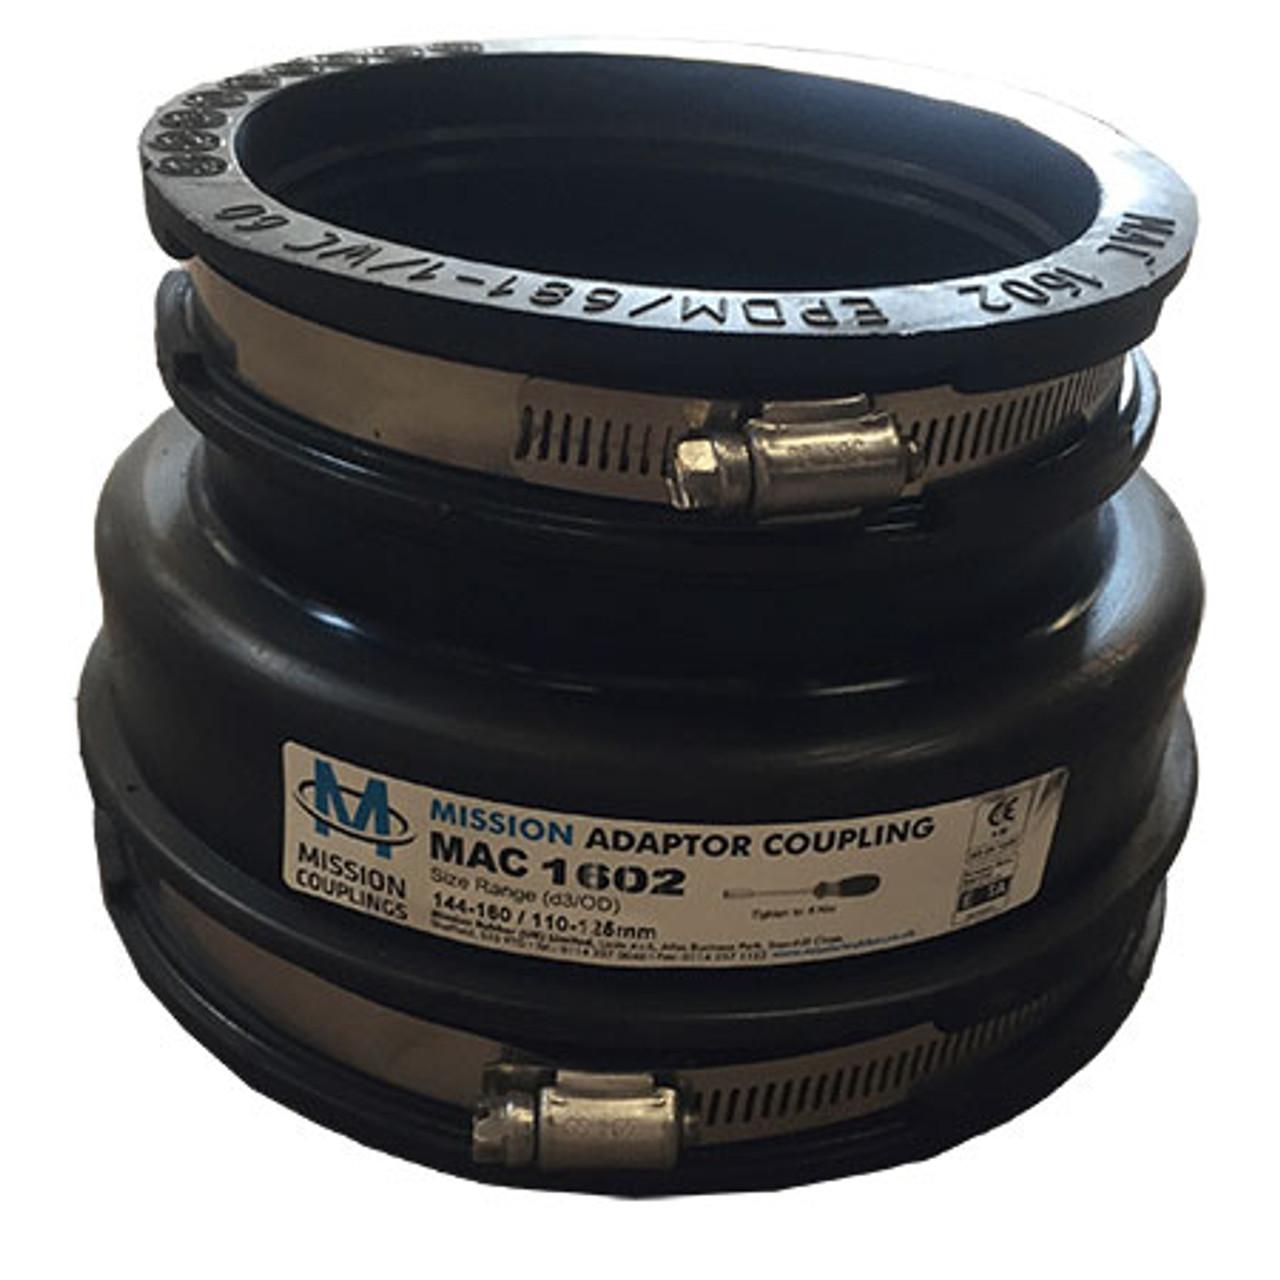 144-160/110-125 Drainage Adaptor